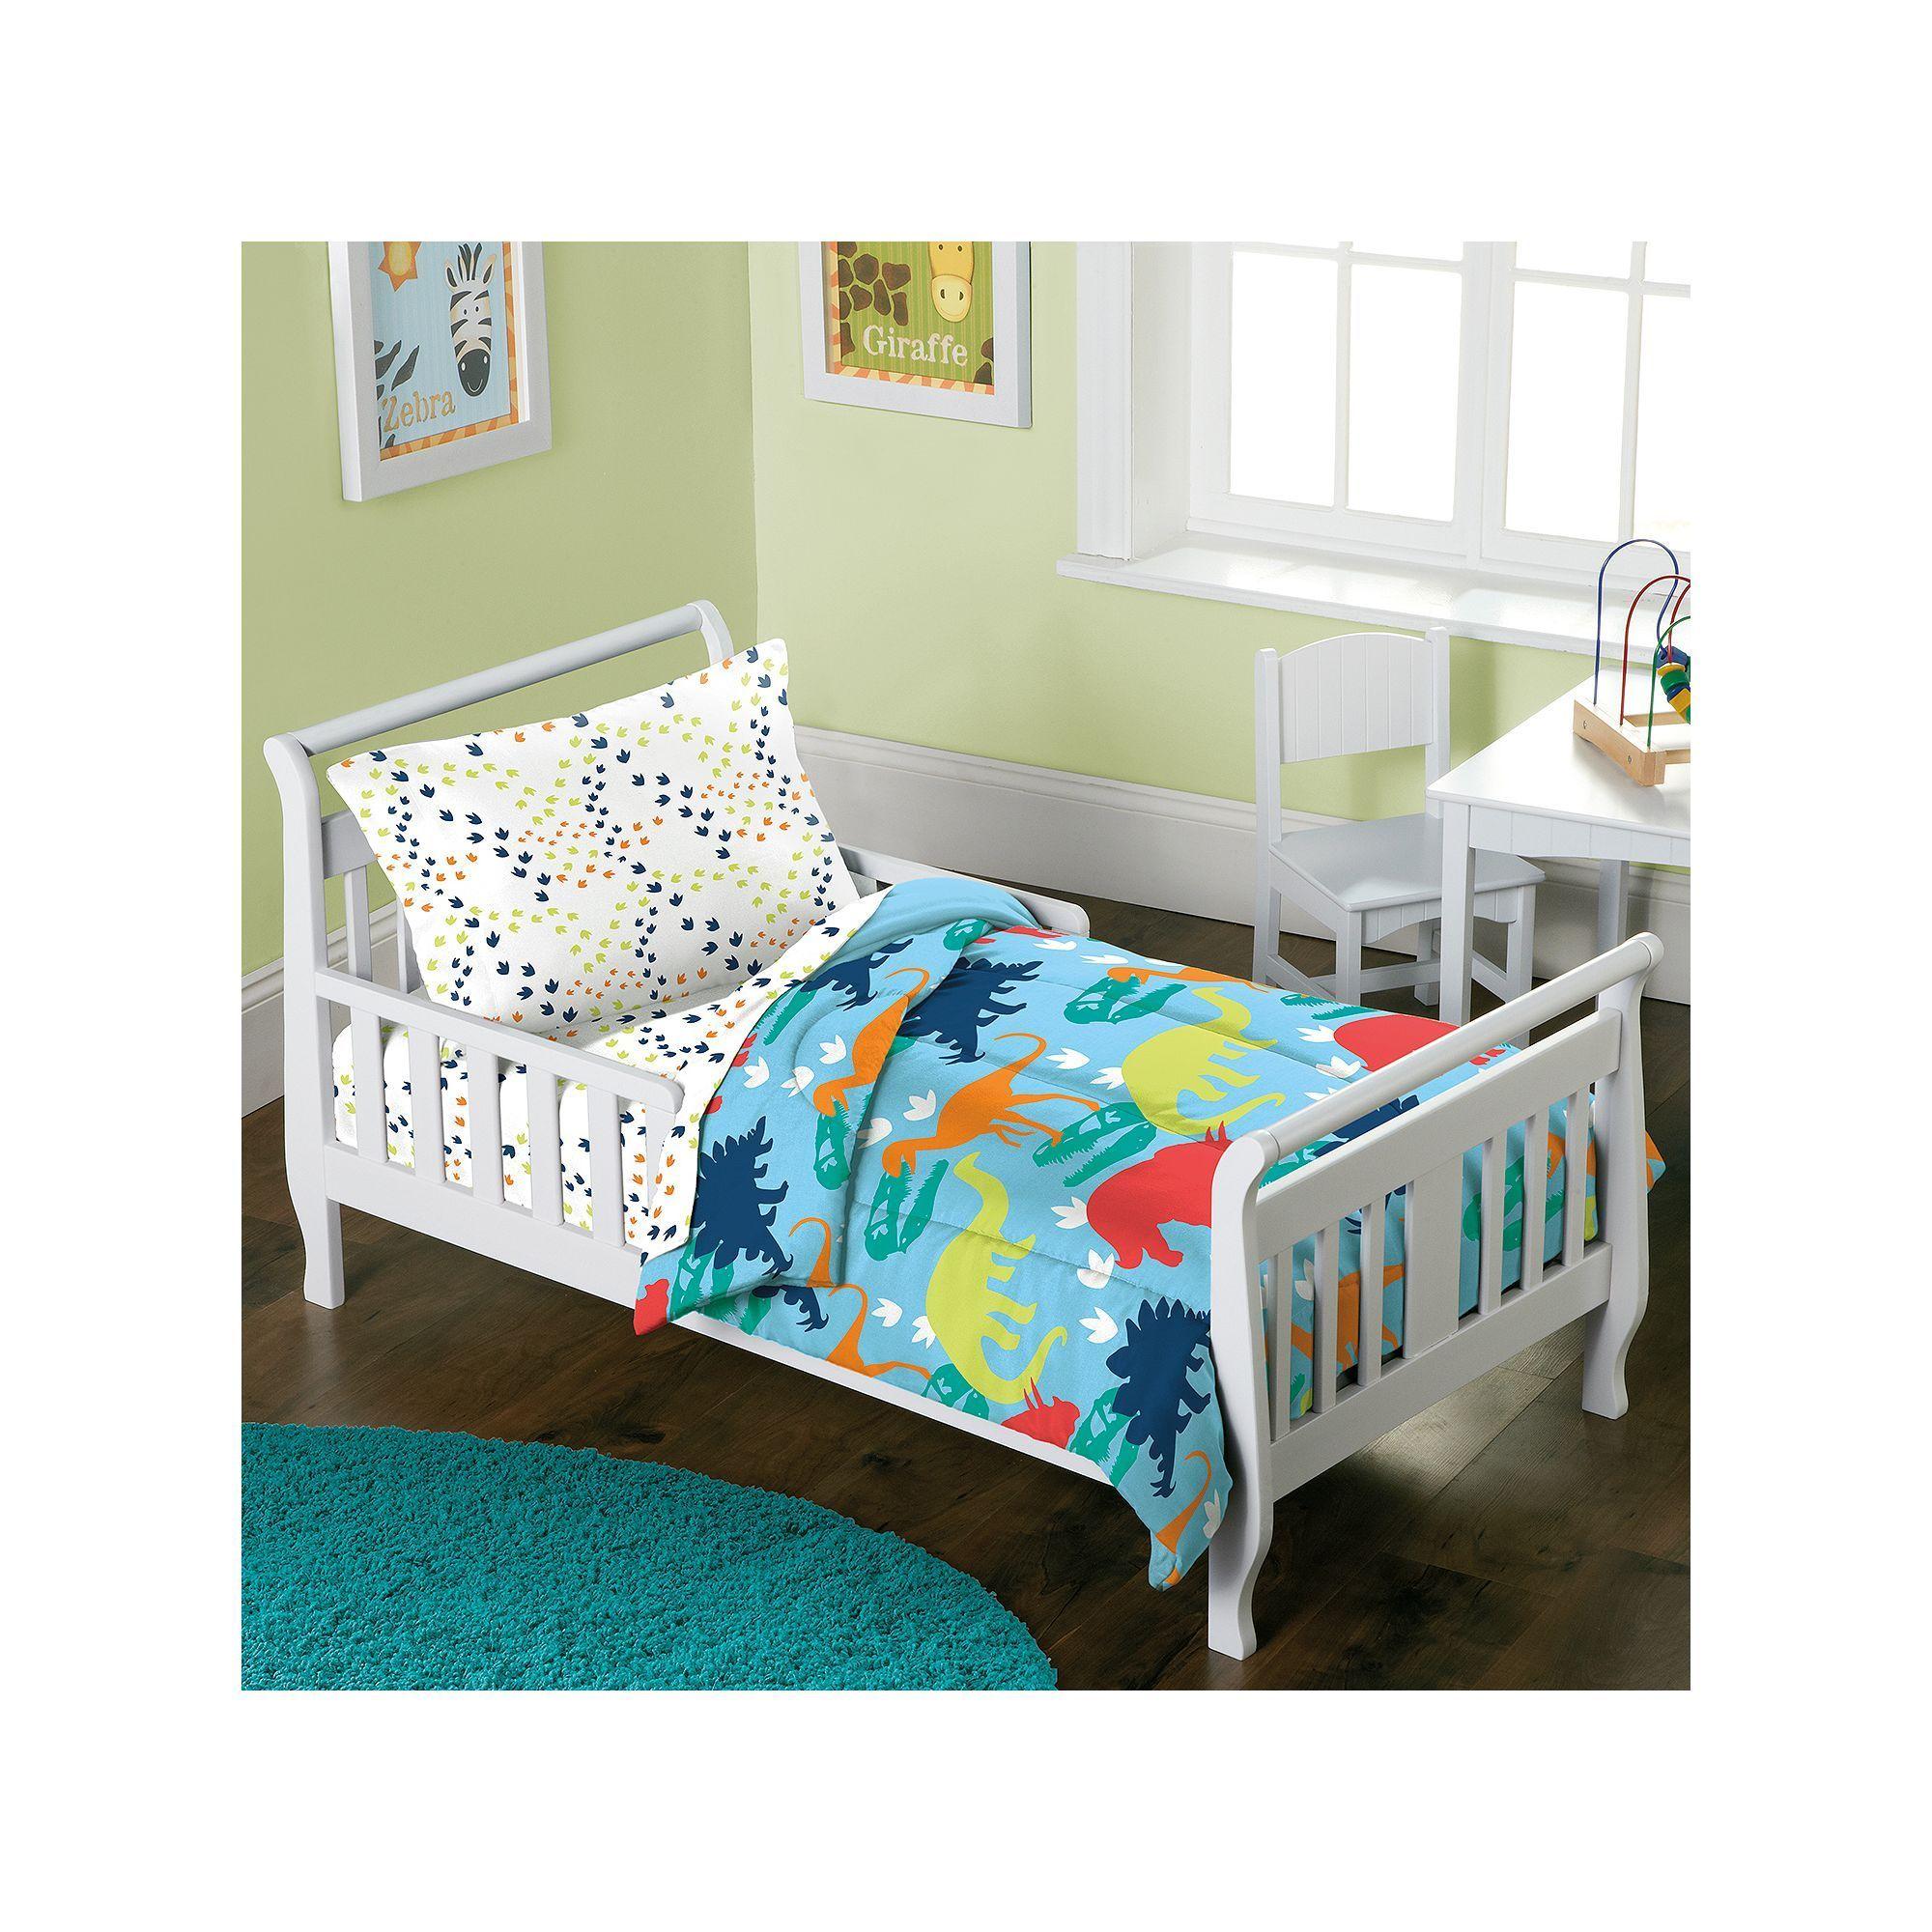 Dream Factory Dinosaur 4-pc. Bed Set - Toddler, Blue   Bed sets, PC ...